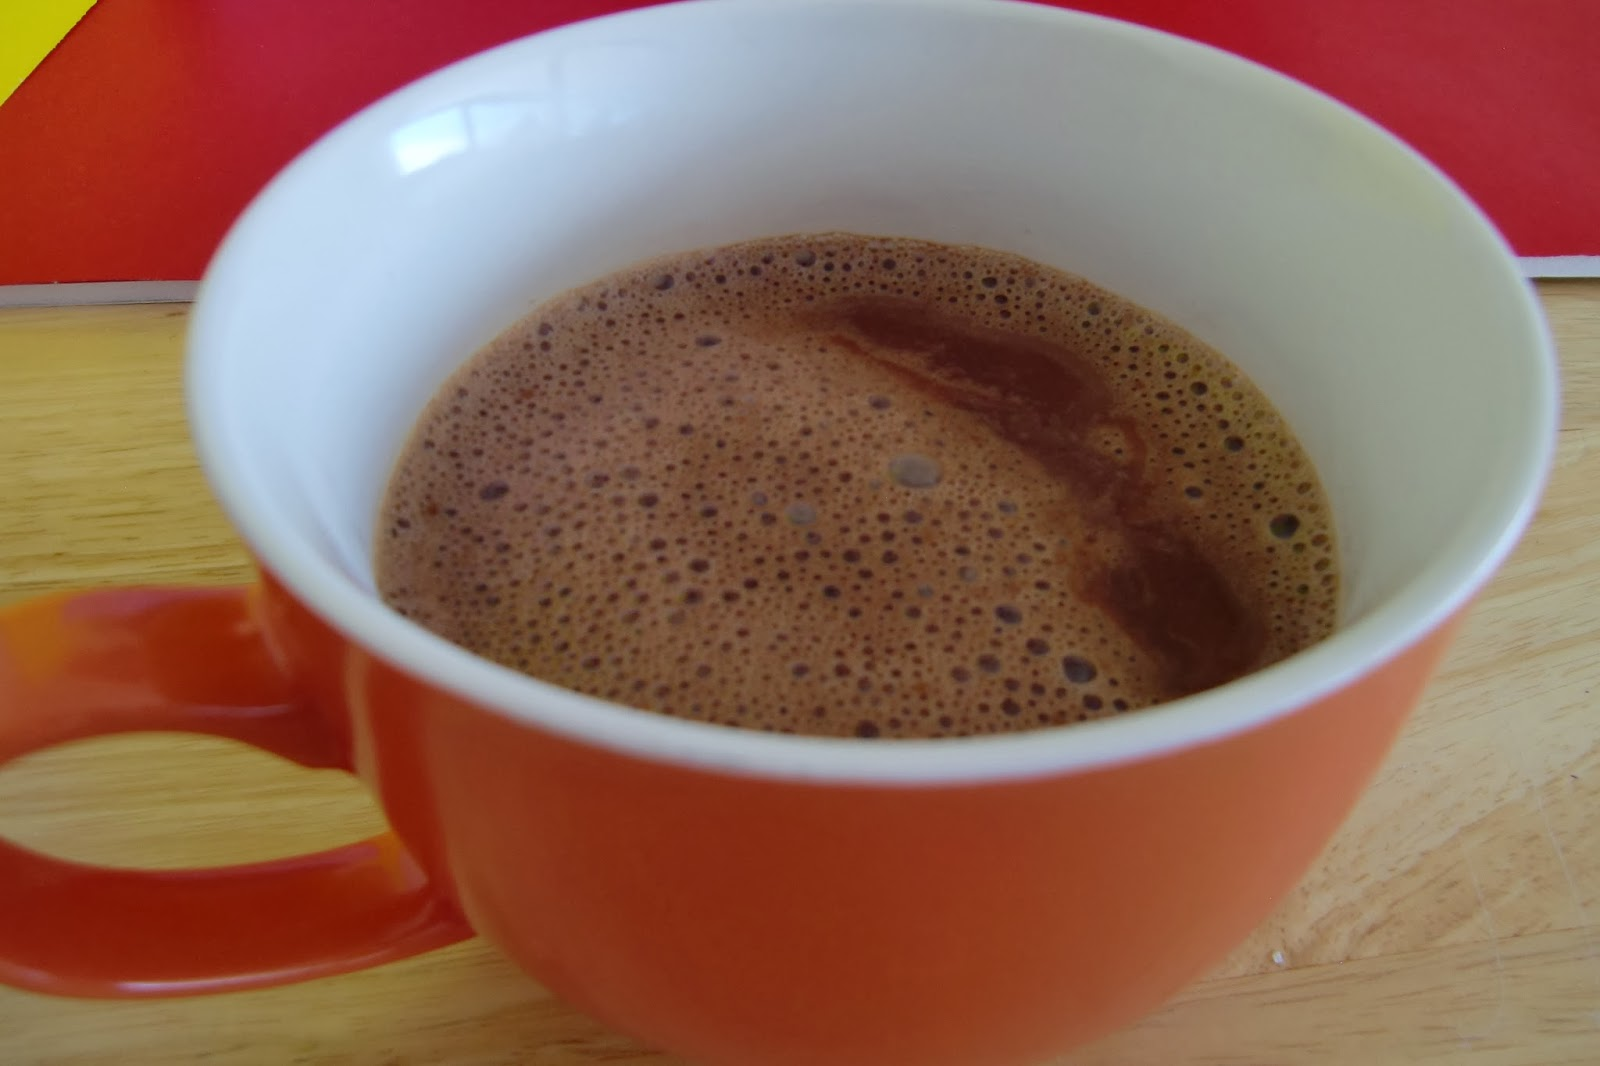 Tipsy Tuesday: Hazelnut Dark Hot Chocolate